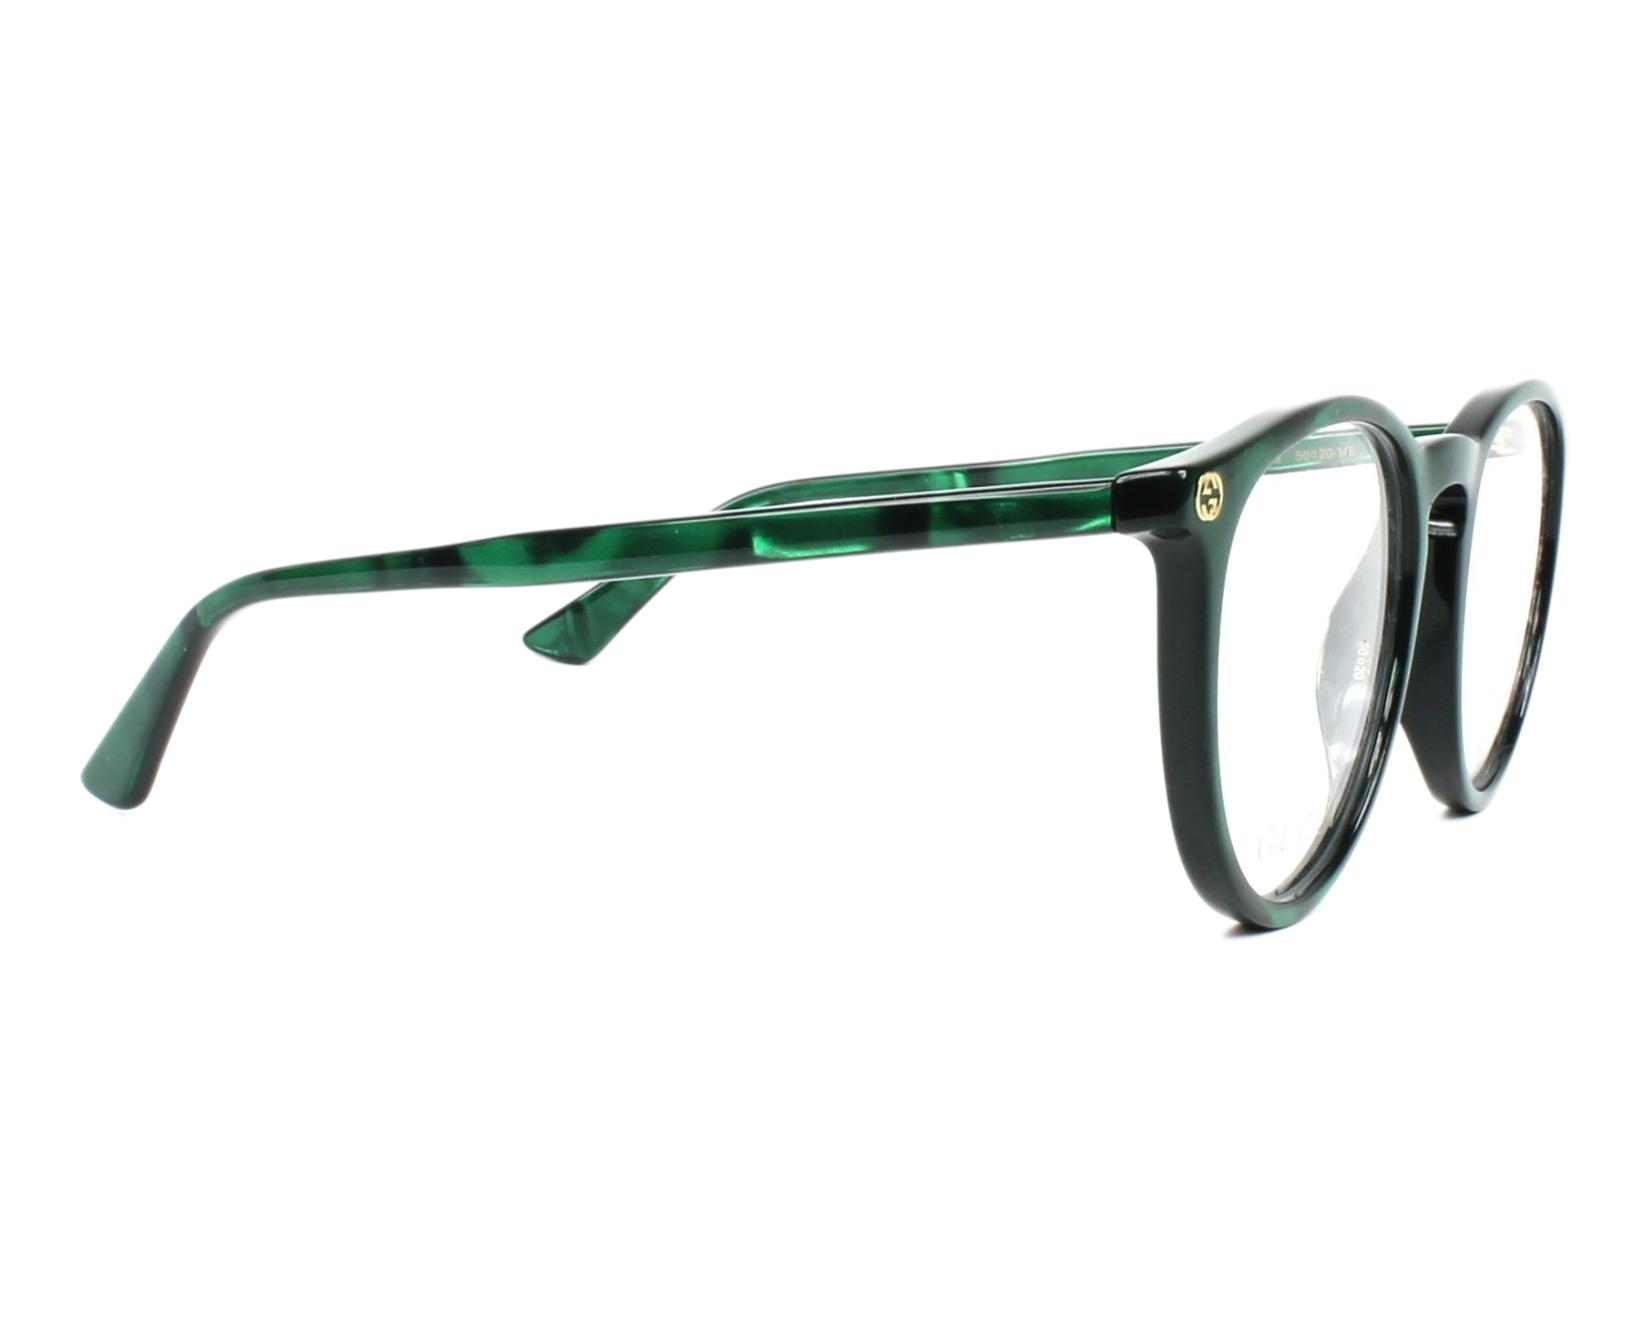 3cfffa4d1bee eyeglasses Gucci GG-00270 006 50-20 Green Green side view